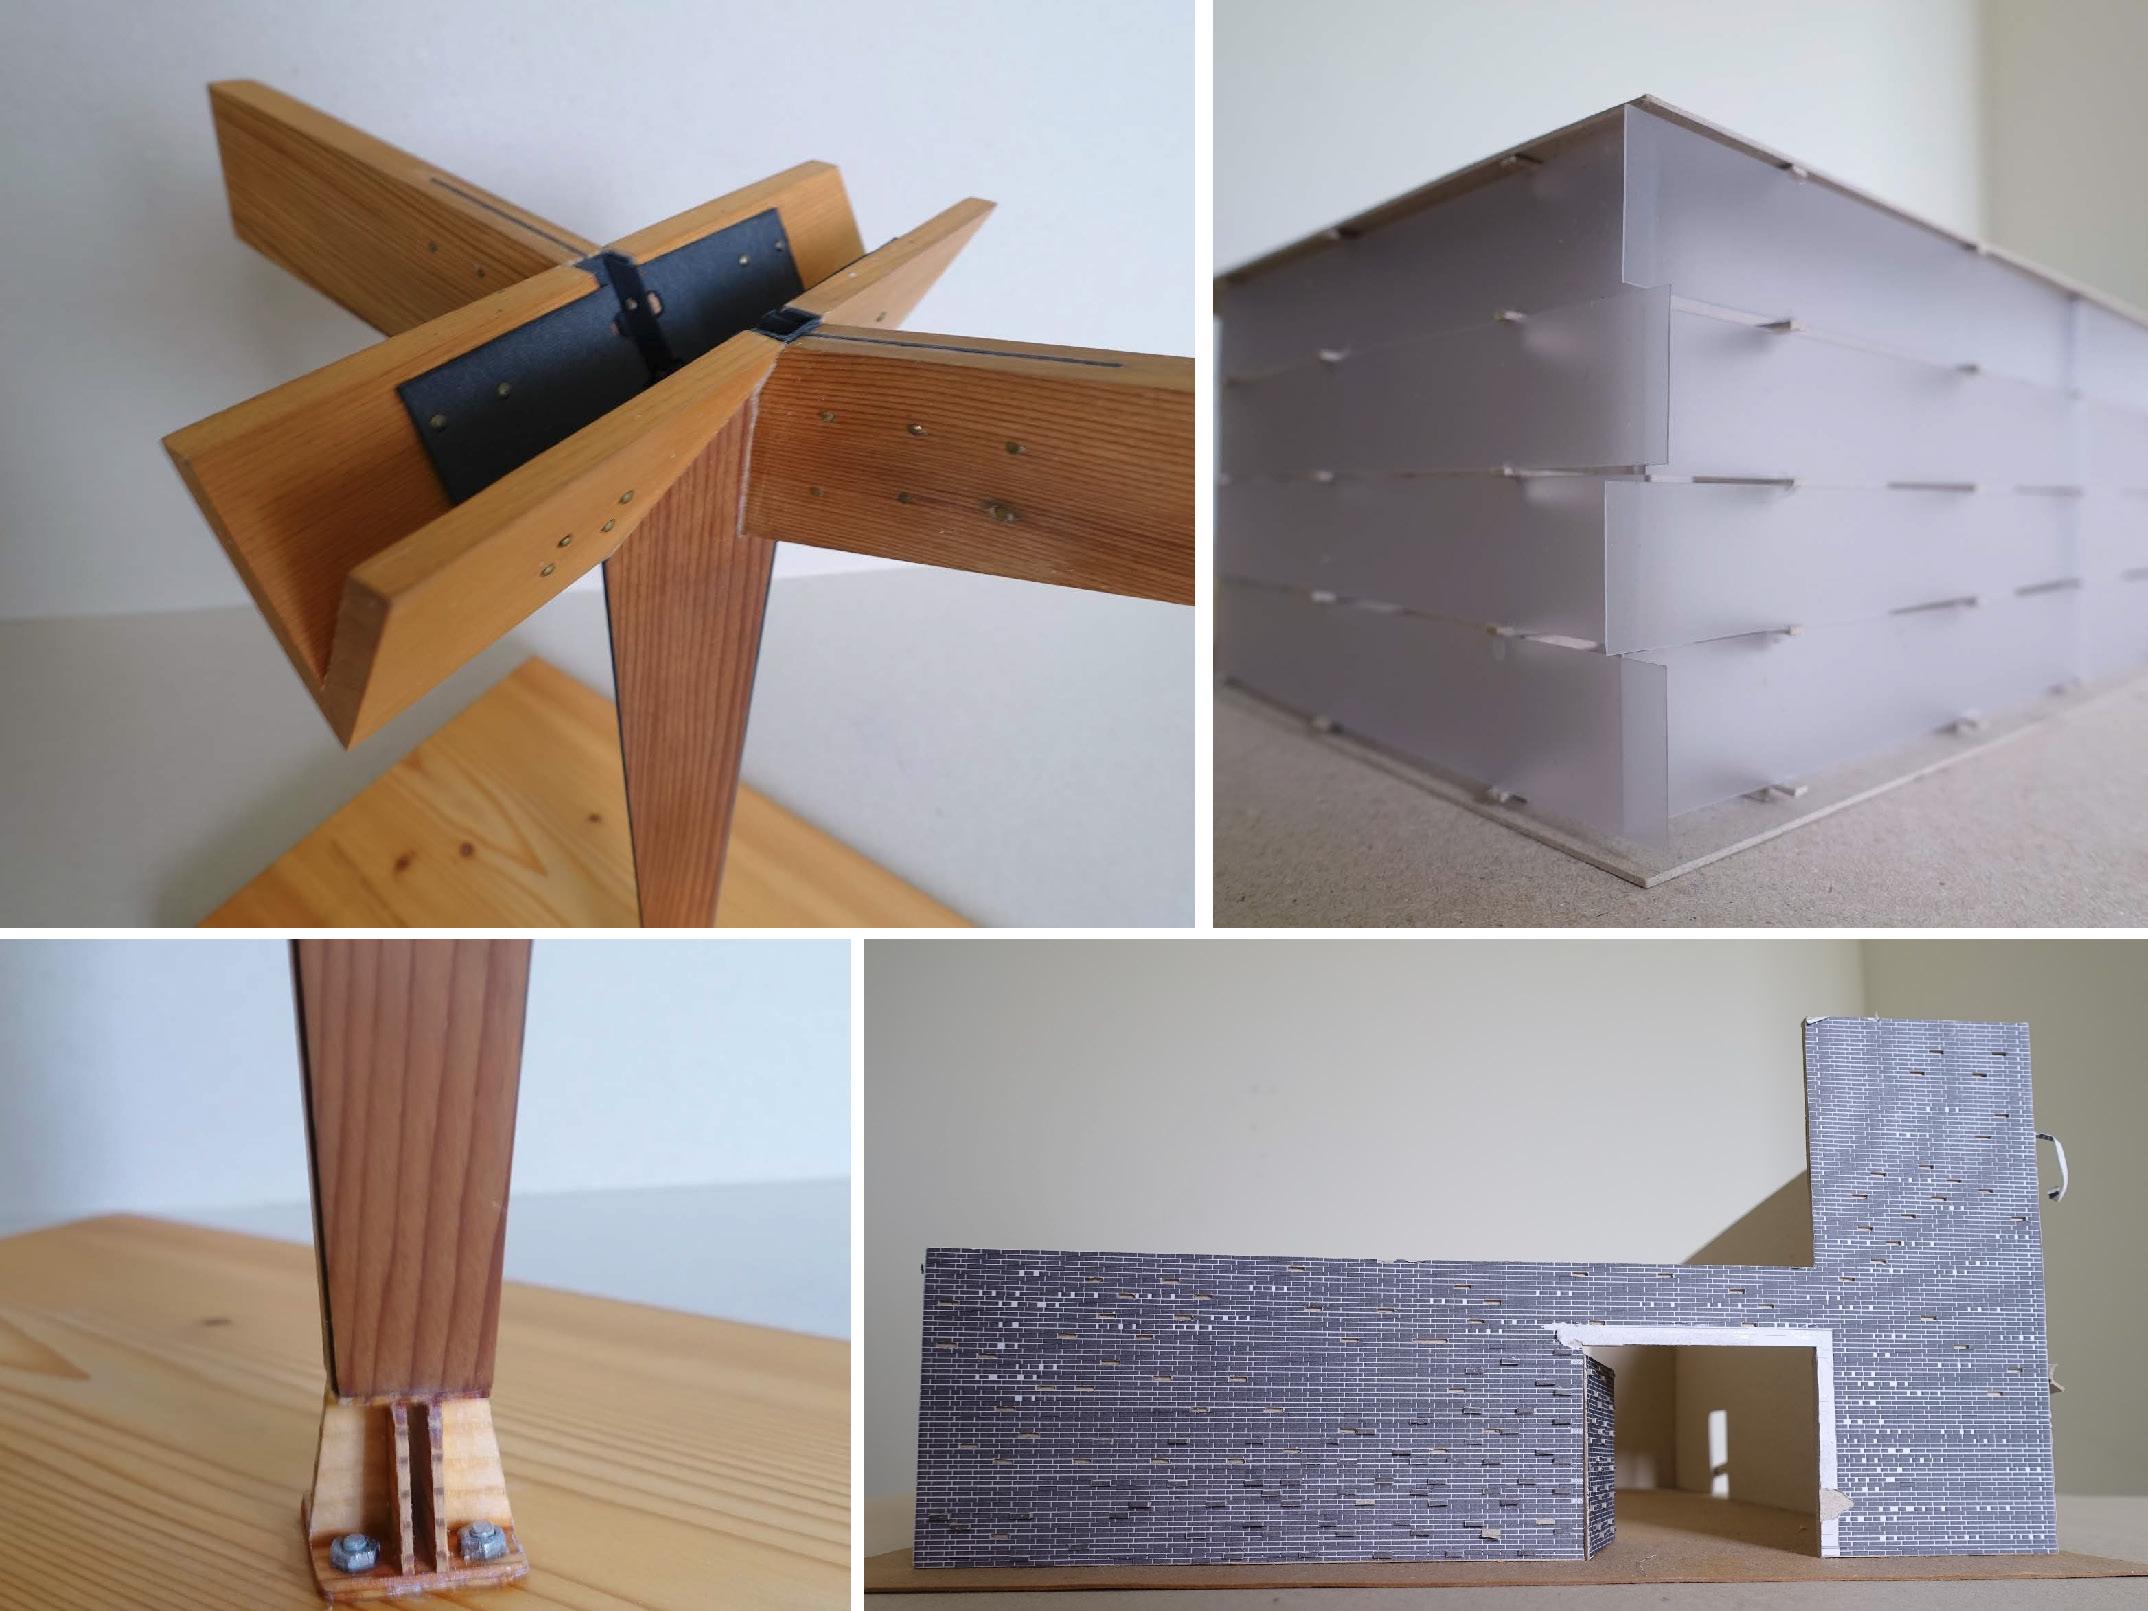 Study model of details }